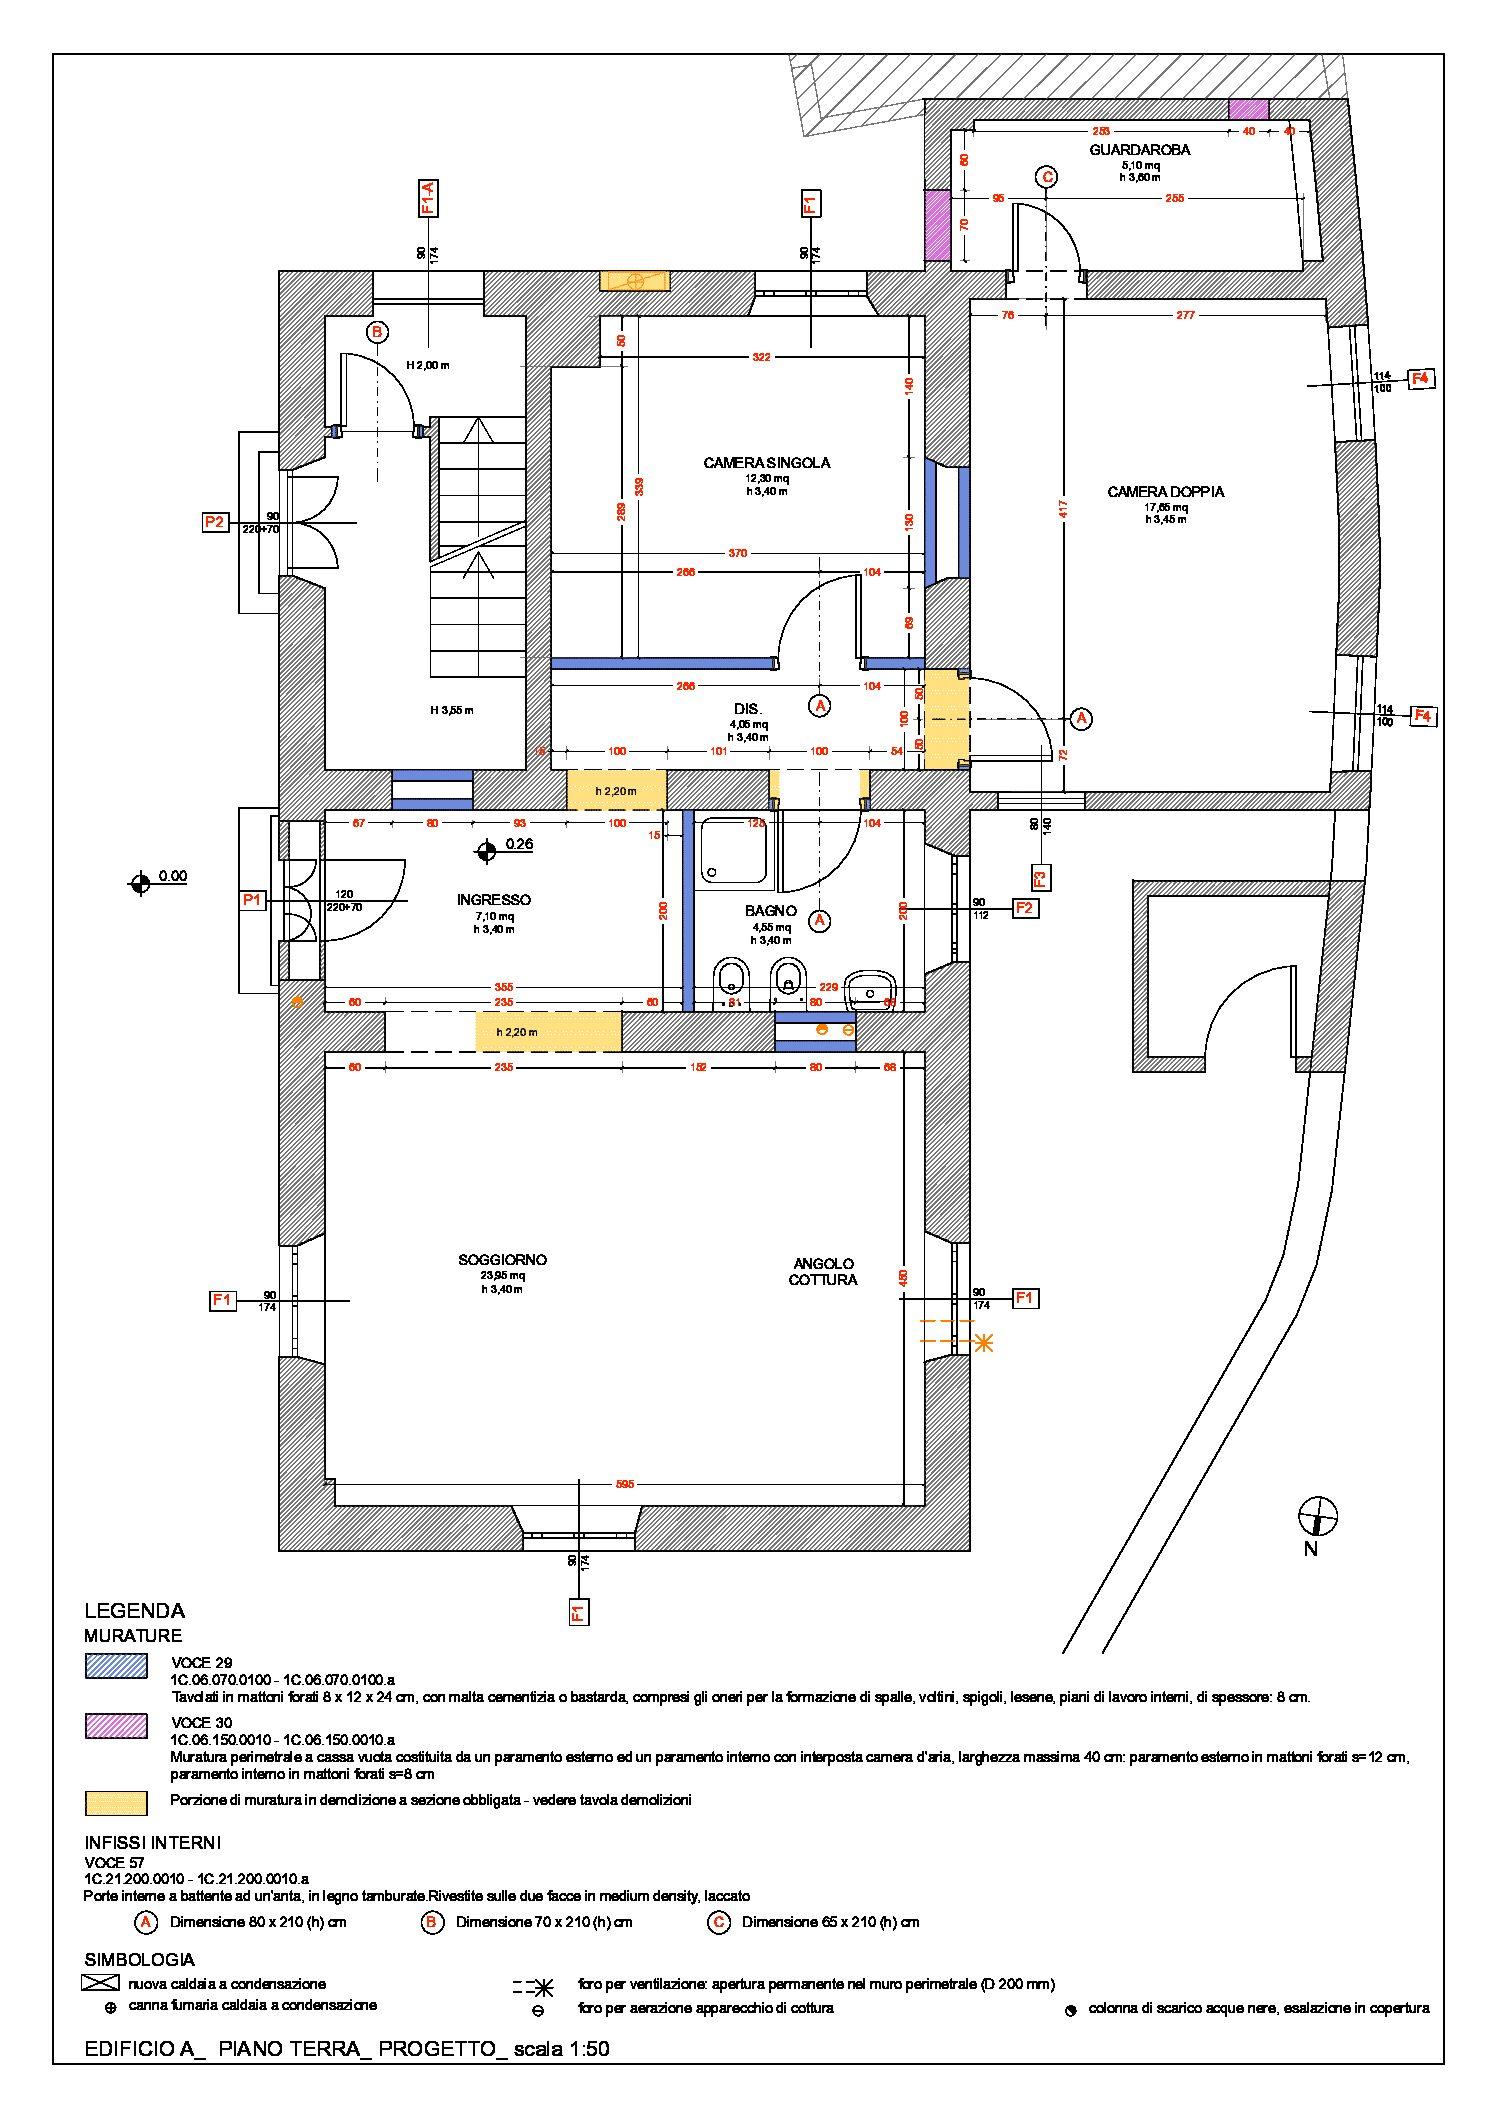 Edificio A: pianta piano terra